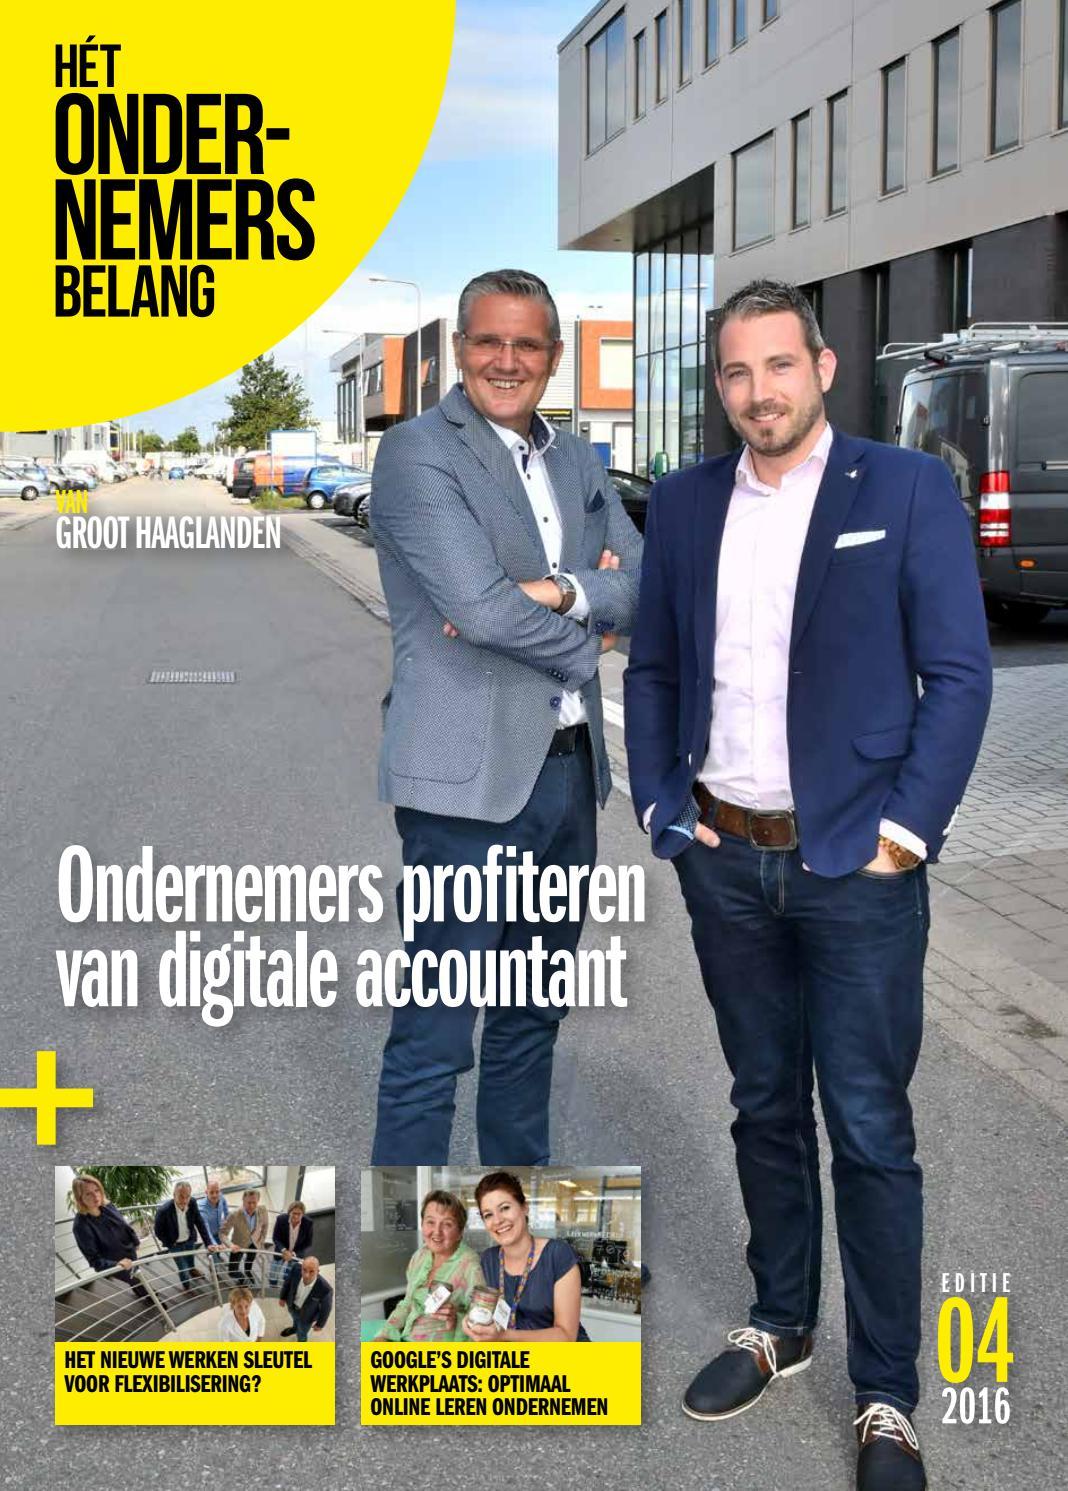 Het ondernemersbelang groot haaglanden 4 2016 by uitgeverij novema ...